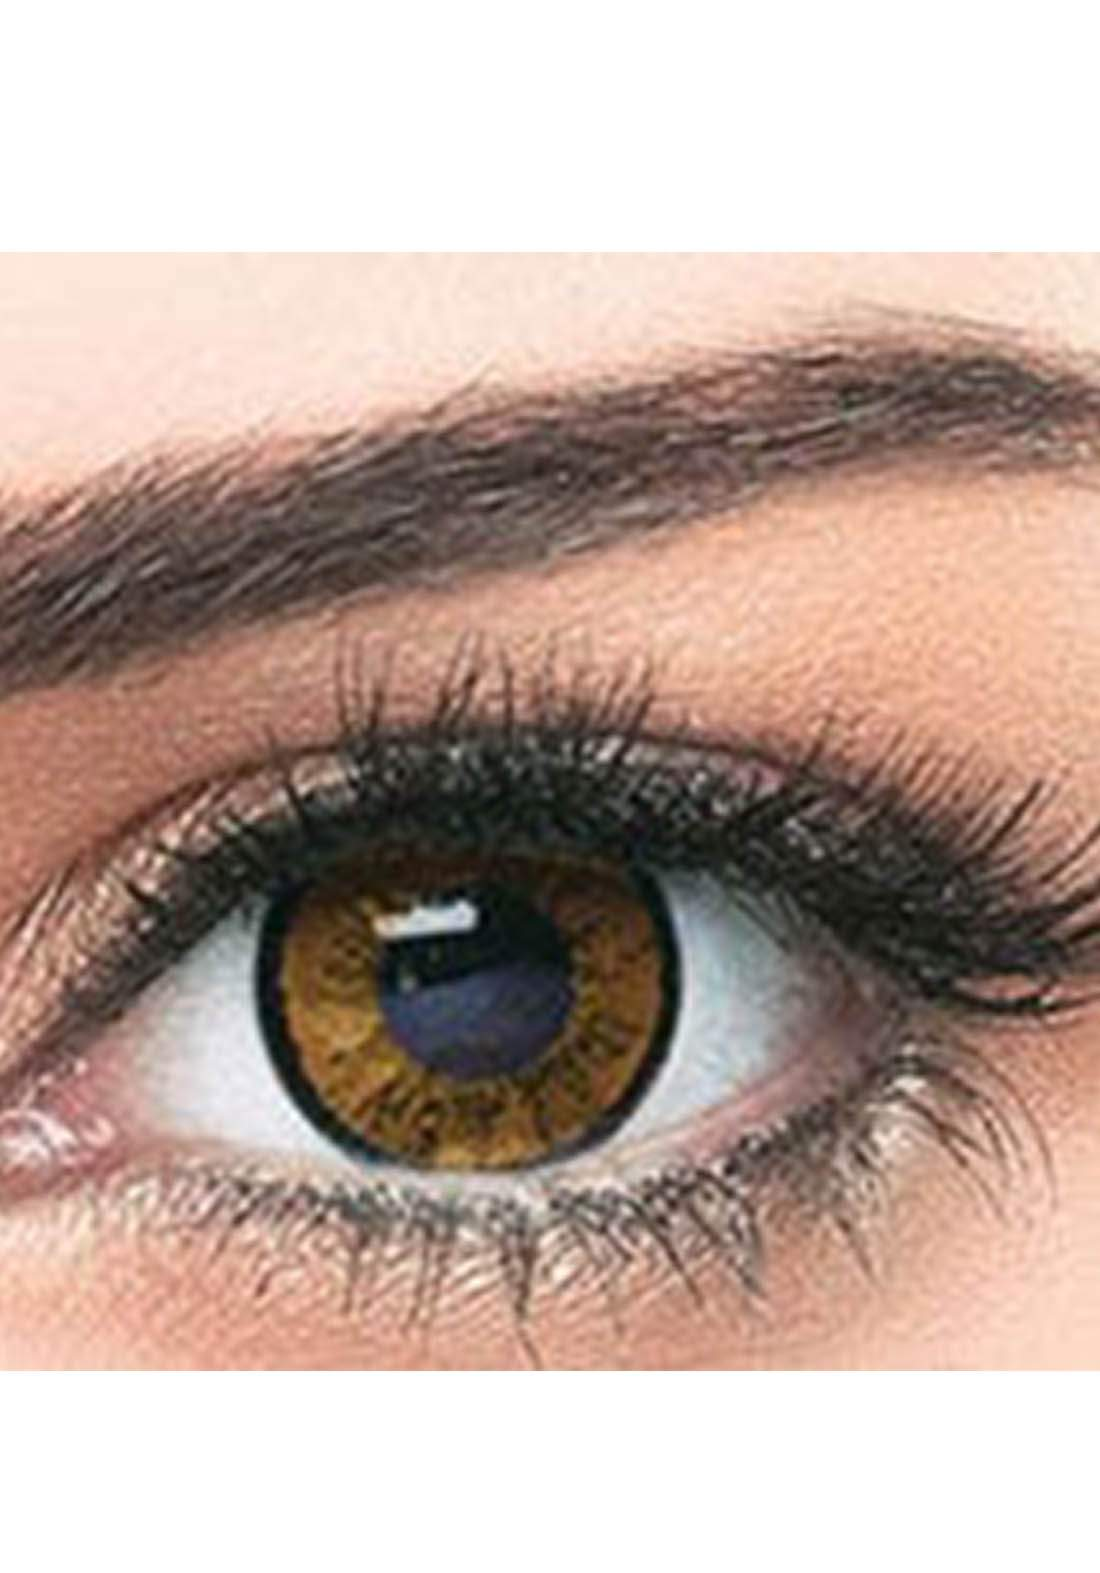 Bella Classic 301007 Contact Lenses 3 Months Use Elegance - Brown  No.7 عدسات لاصقة